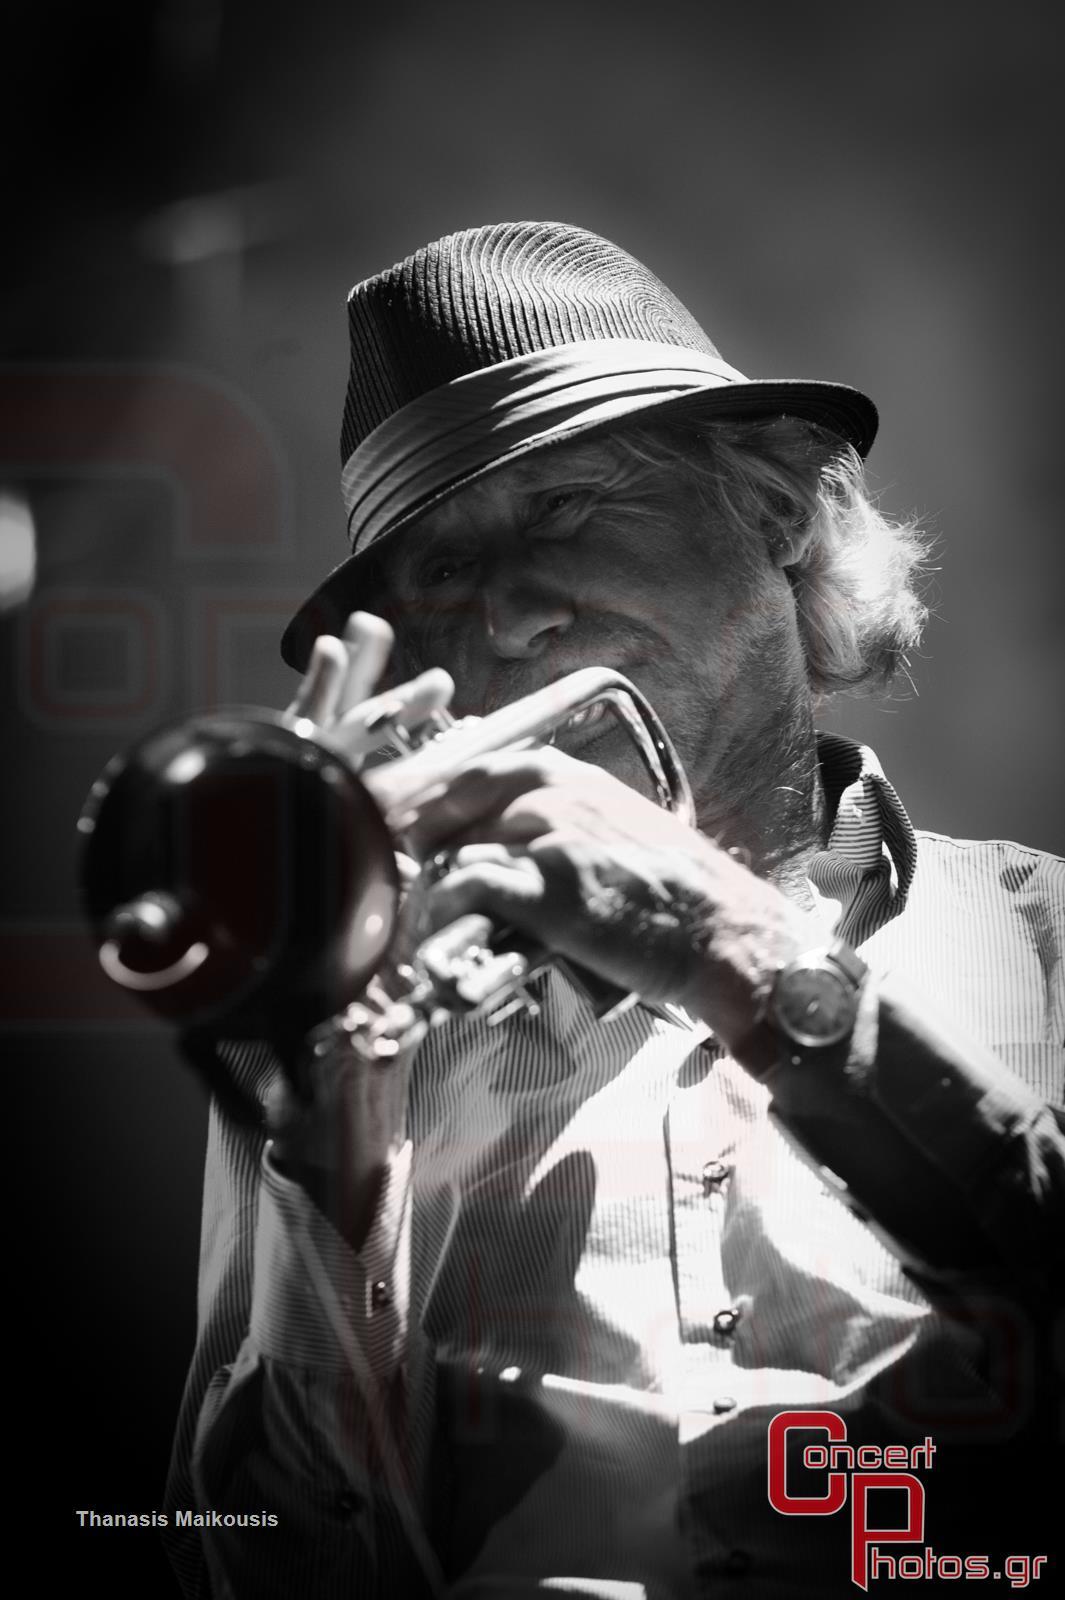 Active Member - Τραγούδα μας να φύγει το σκοτάδι- photographer: Thanasis Maikousis - concertphotos_-5472